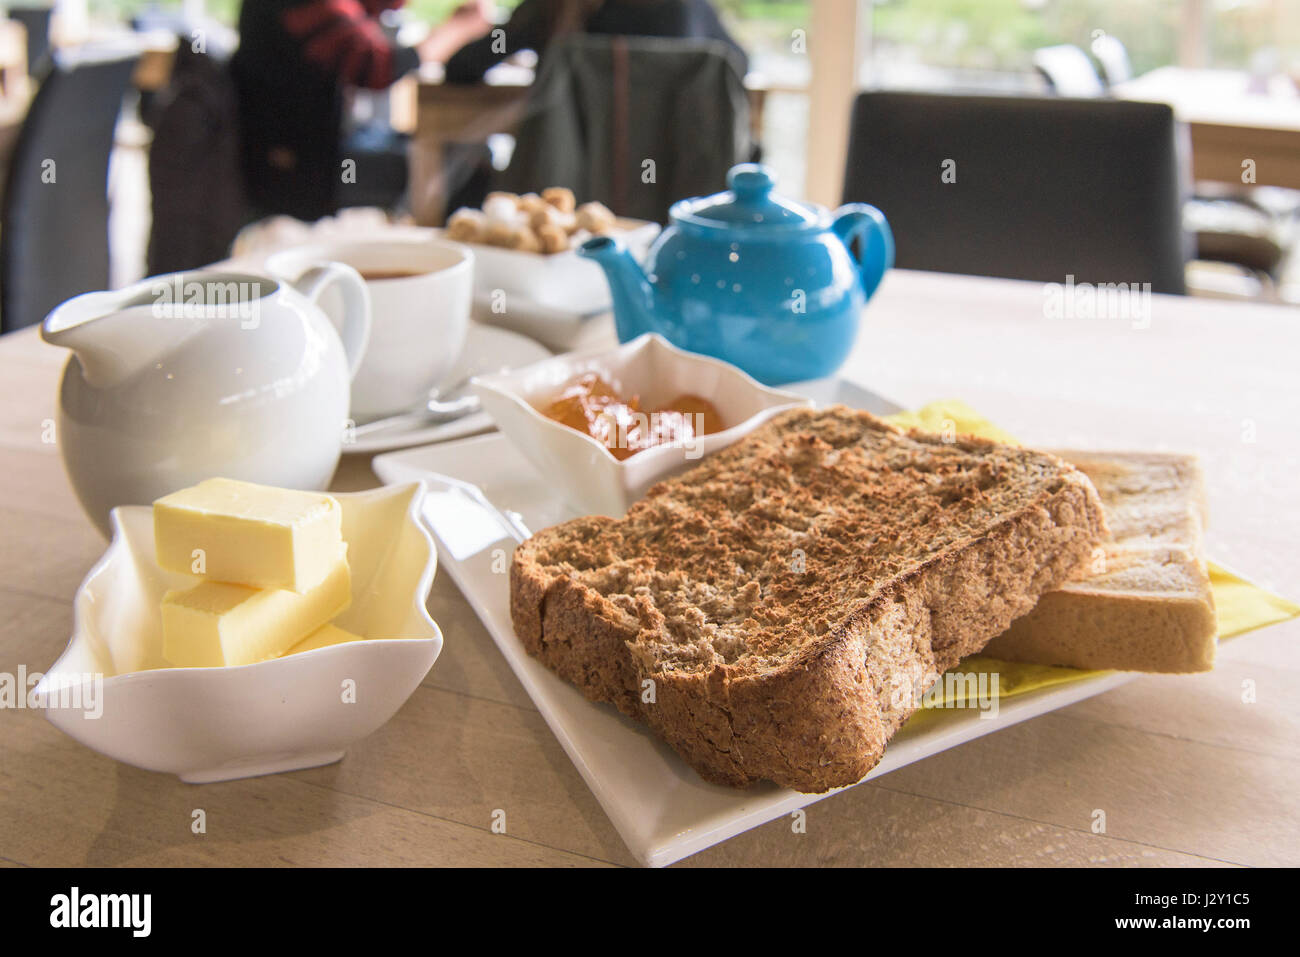 Food Breakfast Tea Toast and marmalade Toast slices Teapot Crockery Morning meal Restaurant Cafe - Stock Image